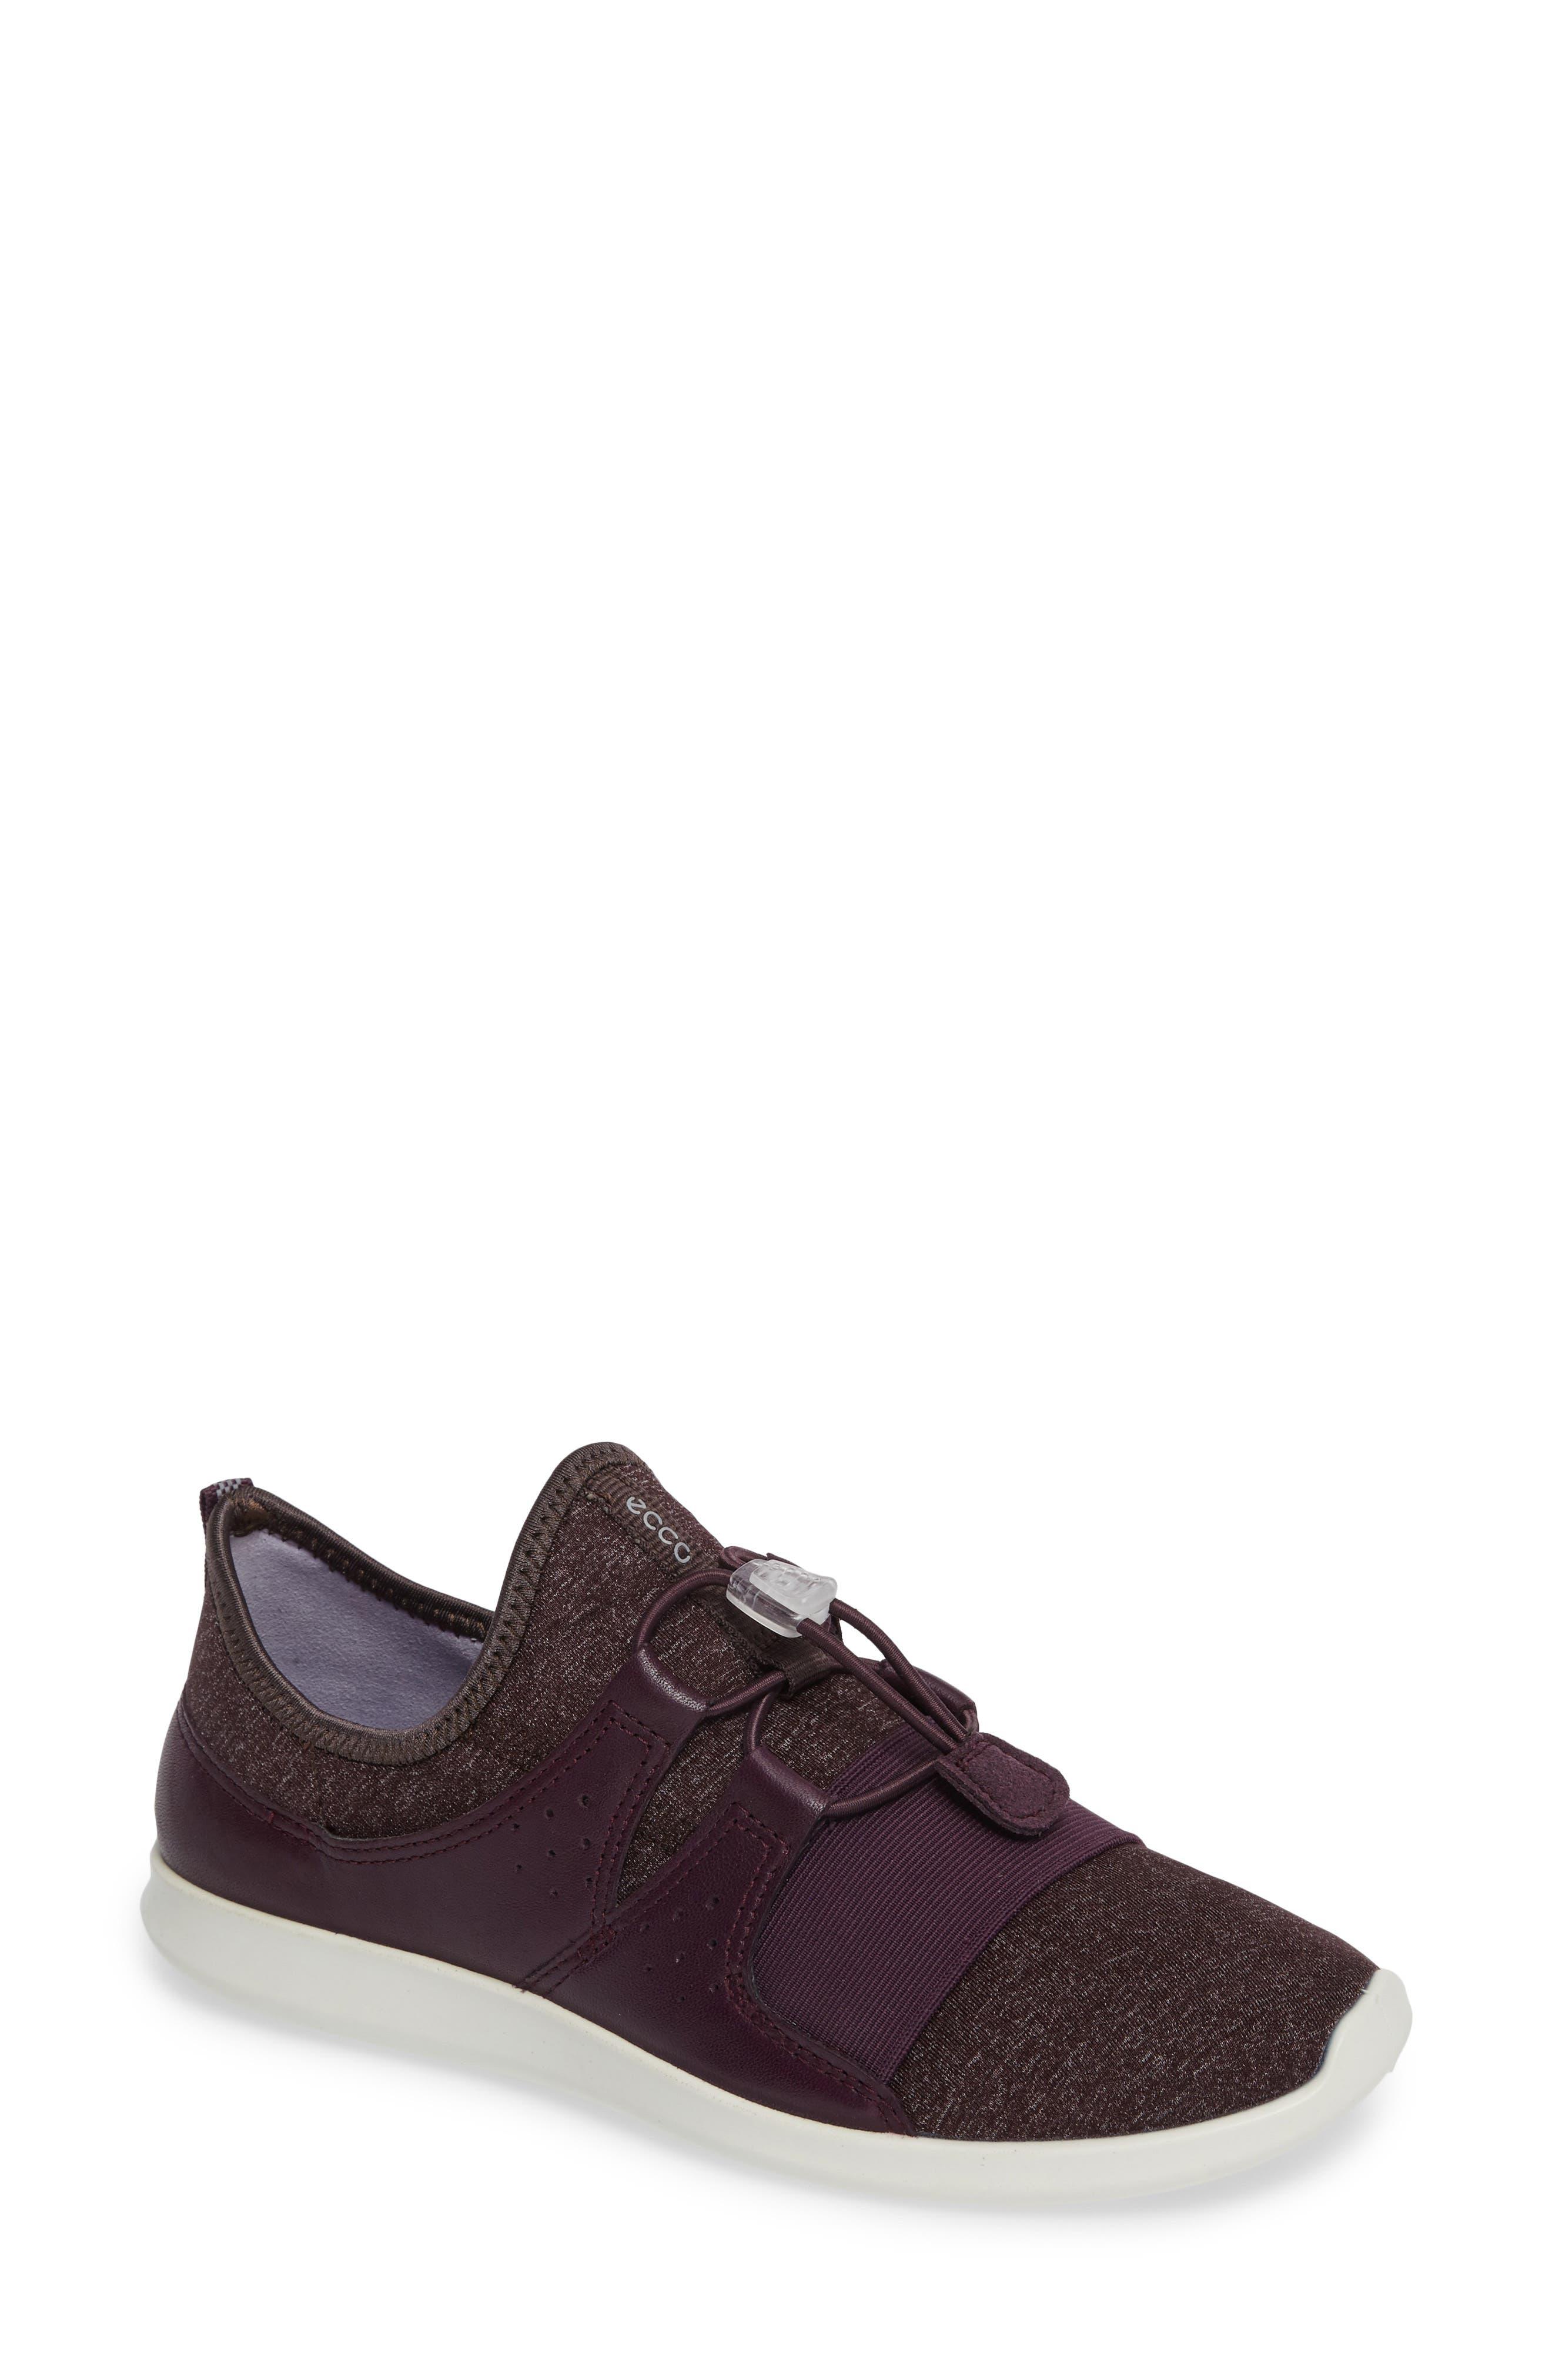 Sense Toggle Sneaker,                             Main thumbnail 1, color,                             Mauve Leather